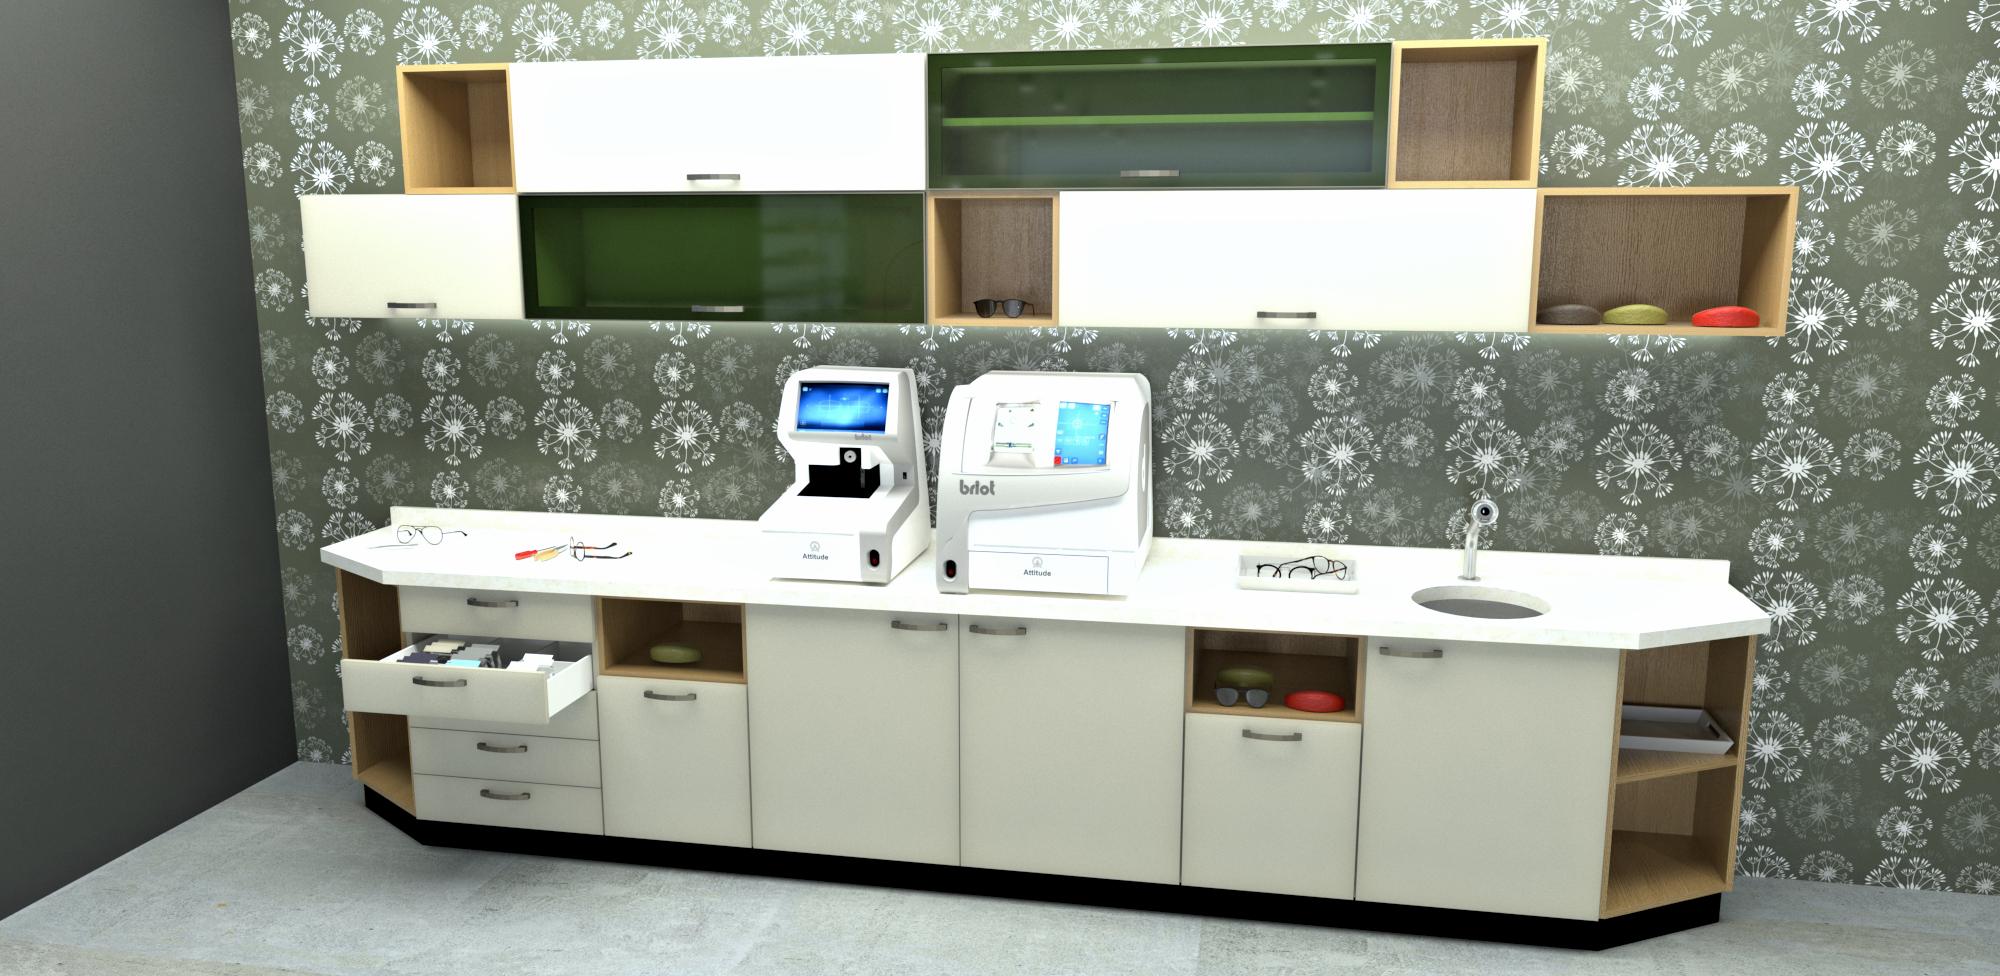 Mirage - Lab 2 - 19.Mär.2018.jpg